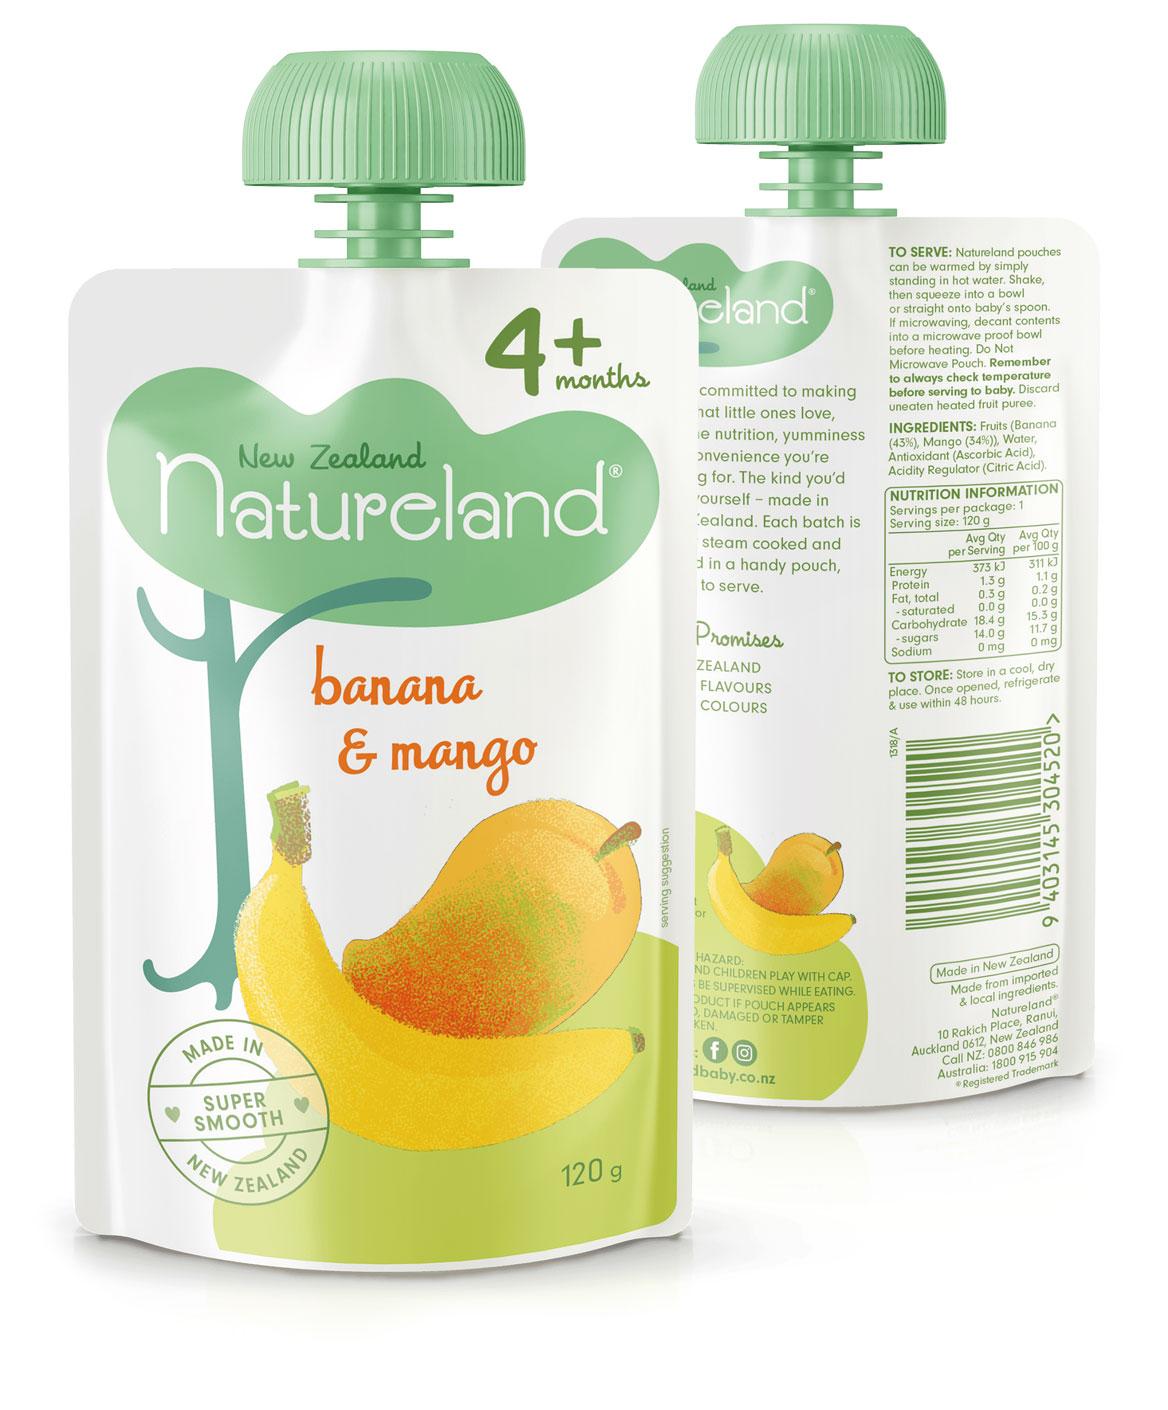 Natureland-120g-Banana-Mango.jpg